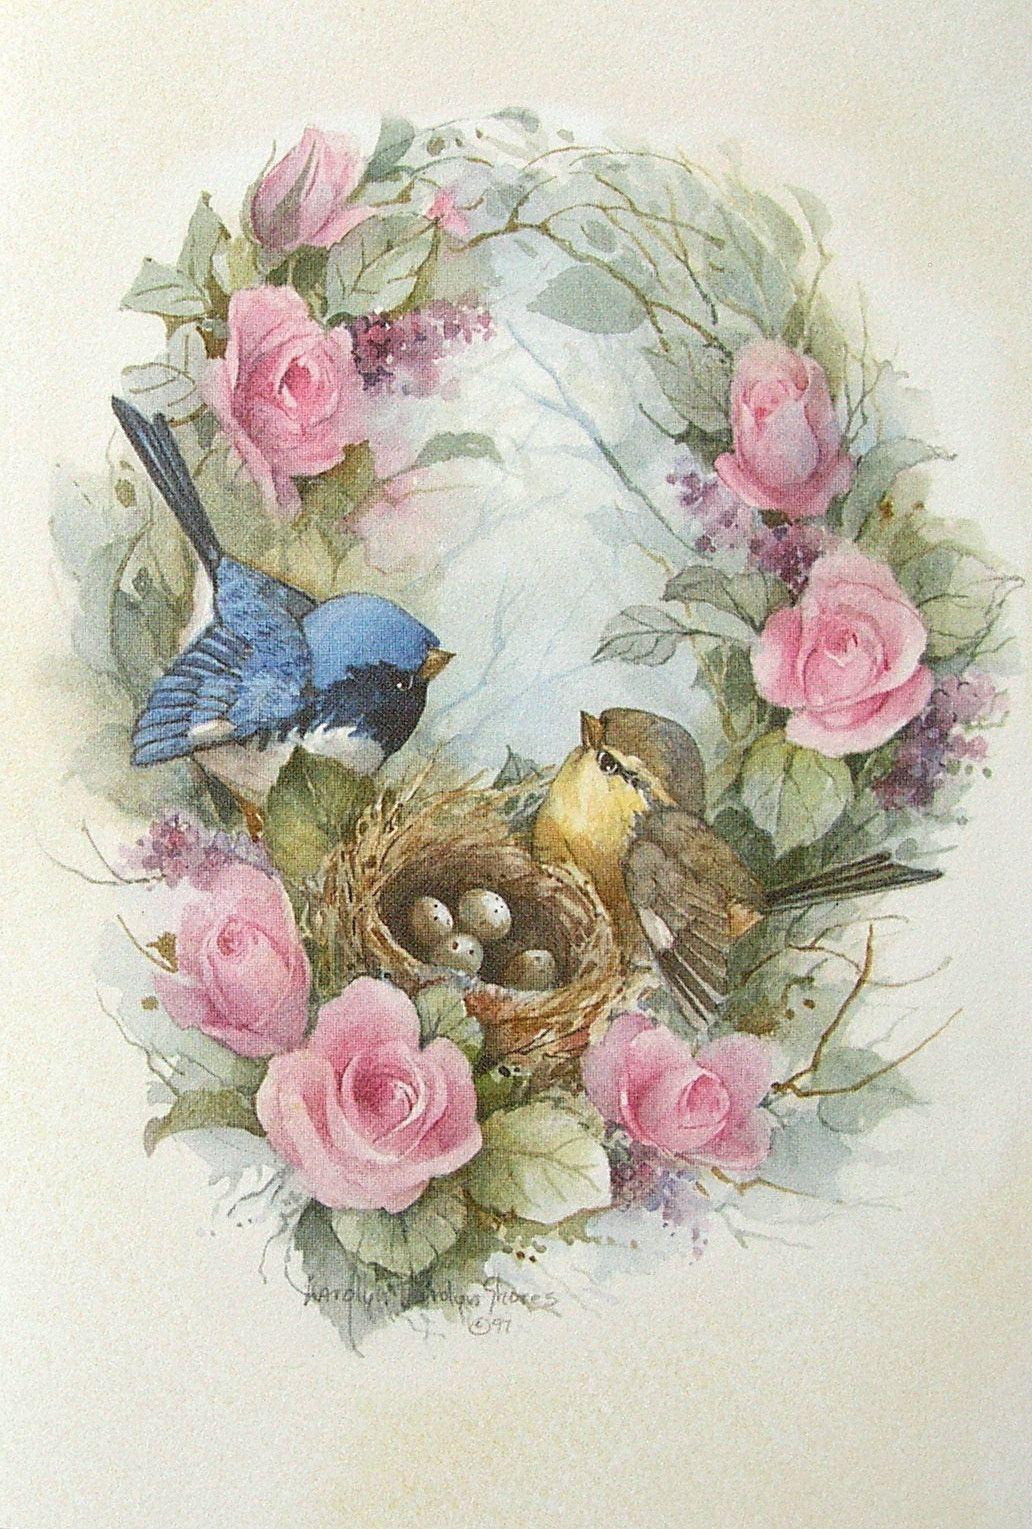 carolyn shores wright birds eggs nest pink rose flowers 1032 x